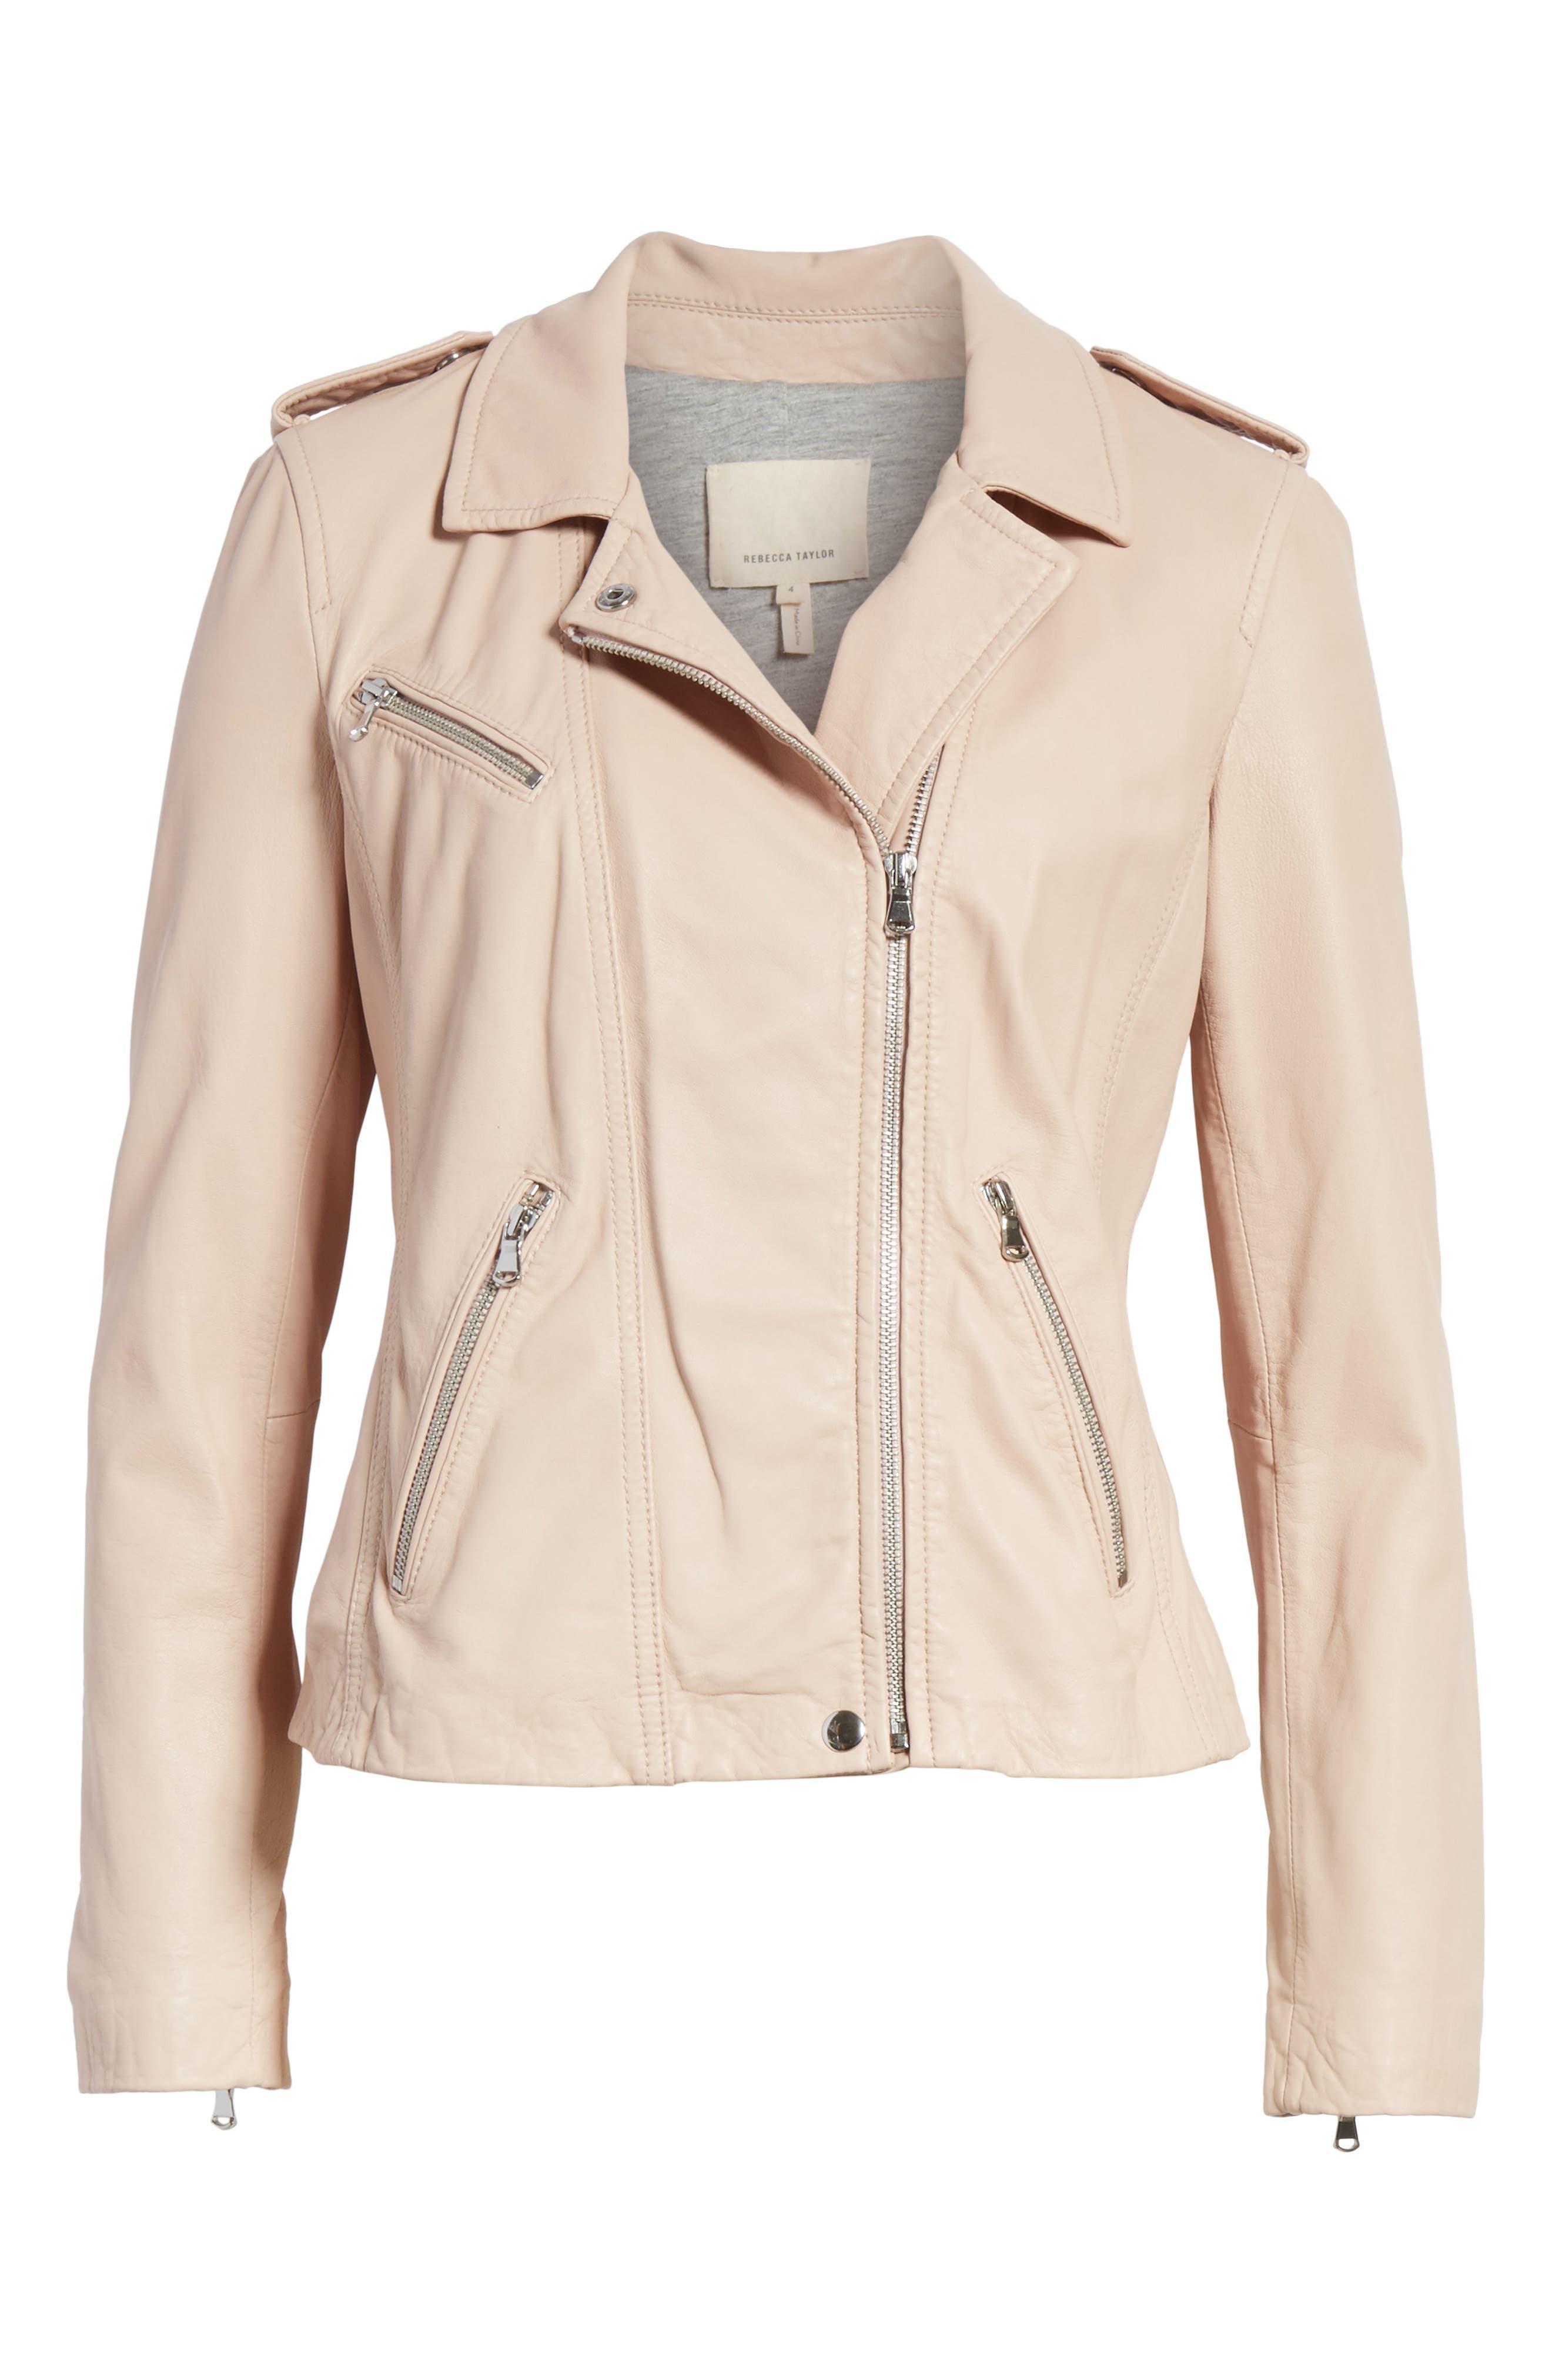 REBECCA TAYLOR, Leather Moto Jacket, Alternate thumbnail 5, color, NUDE